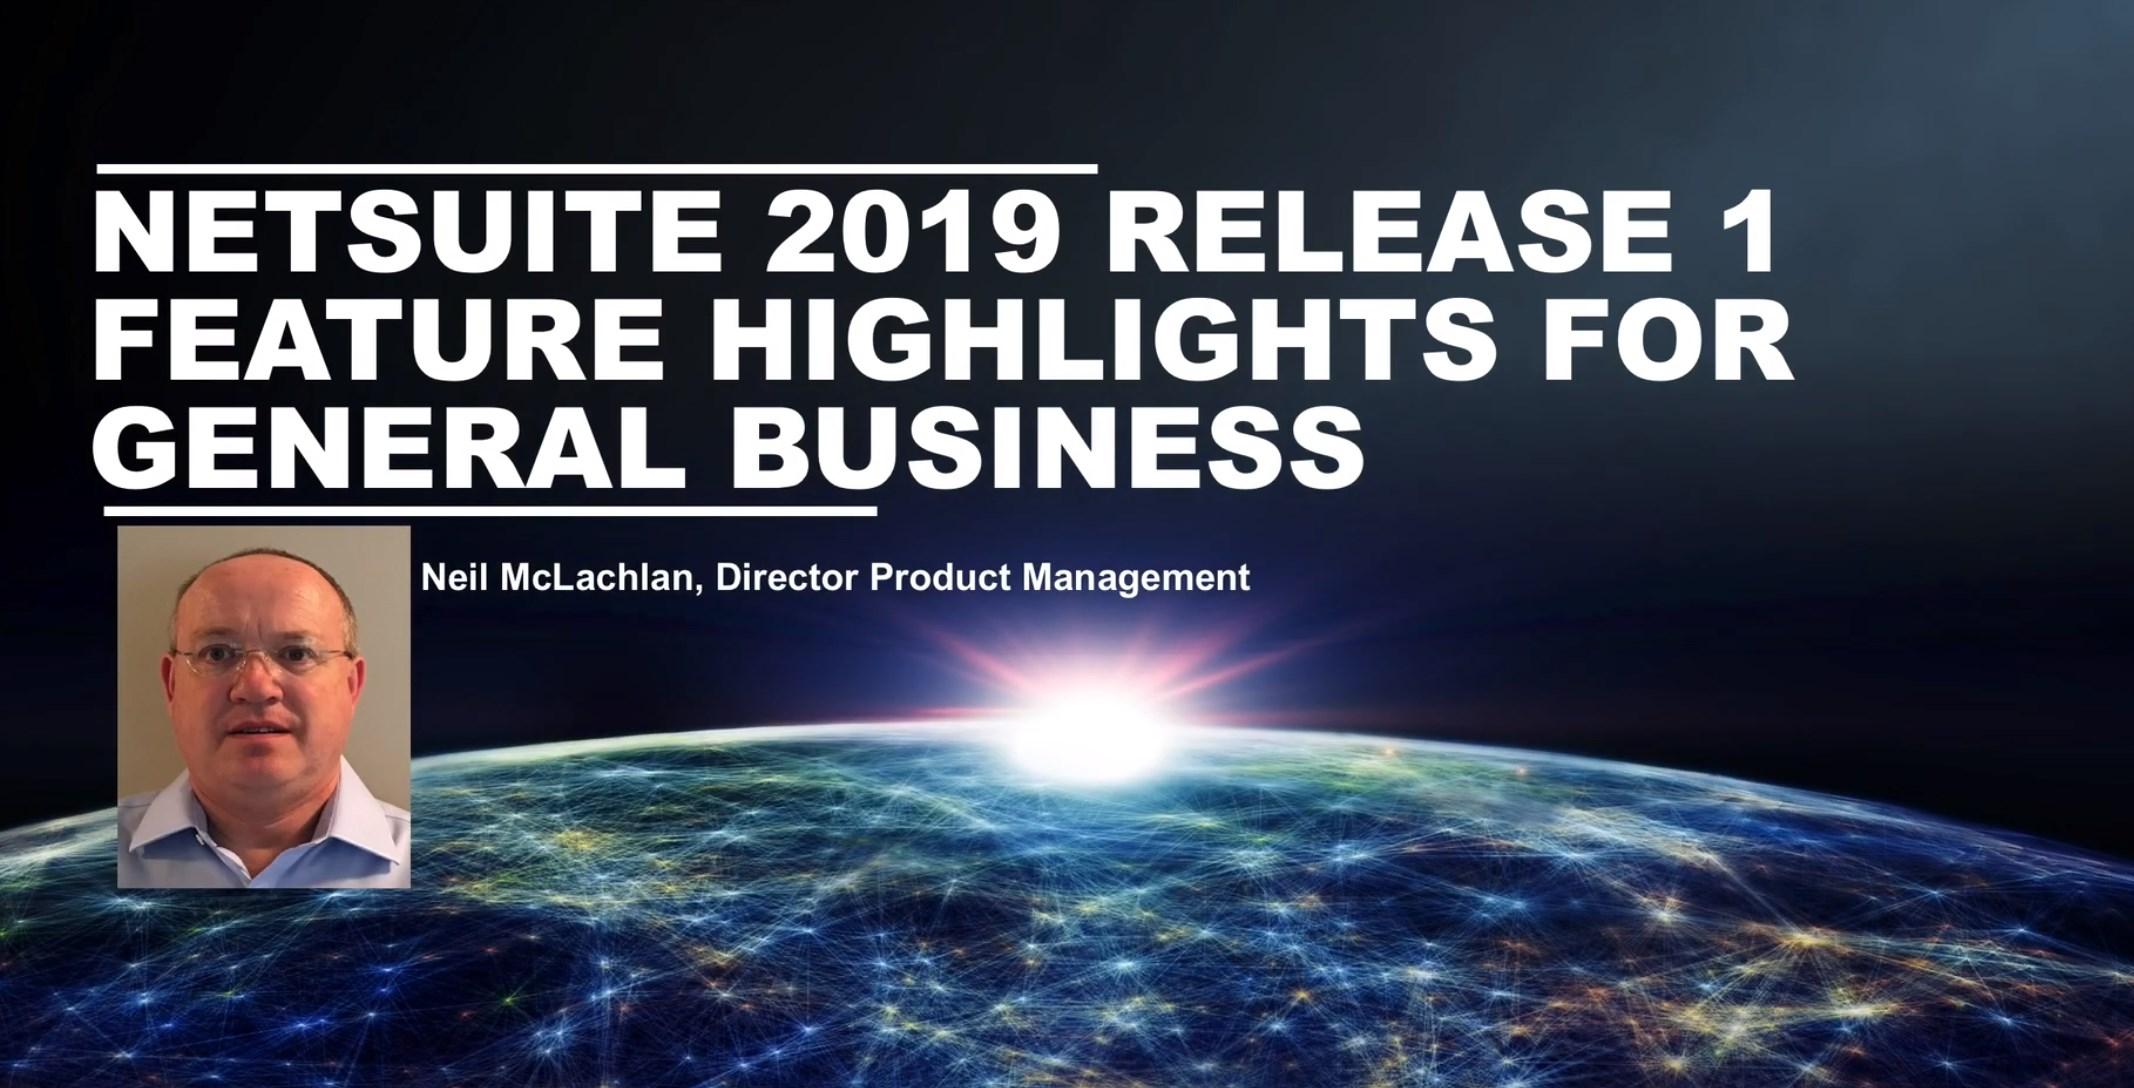 ns-release-20191-gen-business